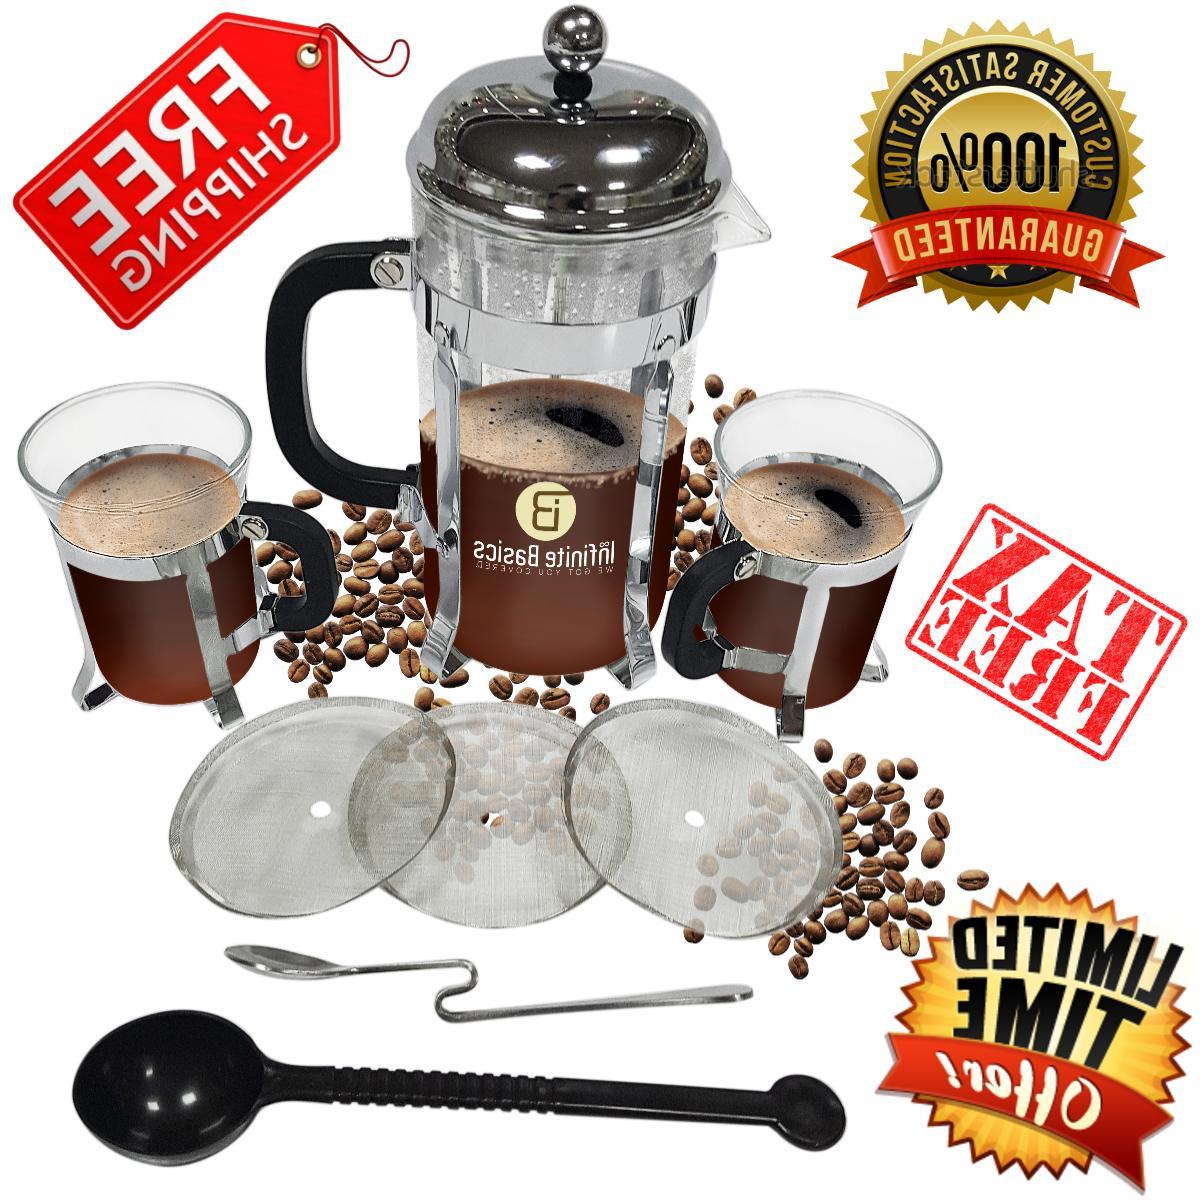 french press coffee maker set